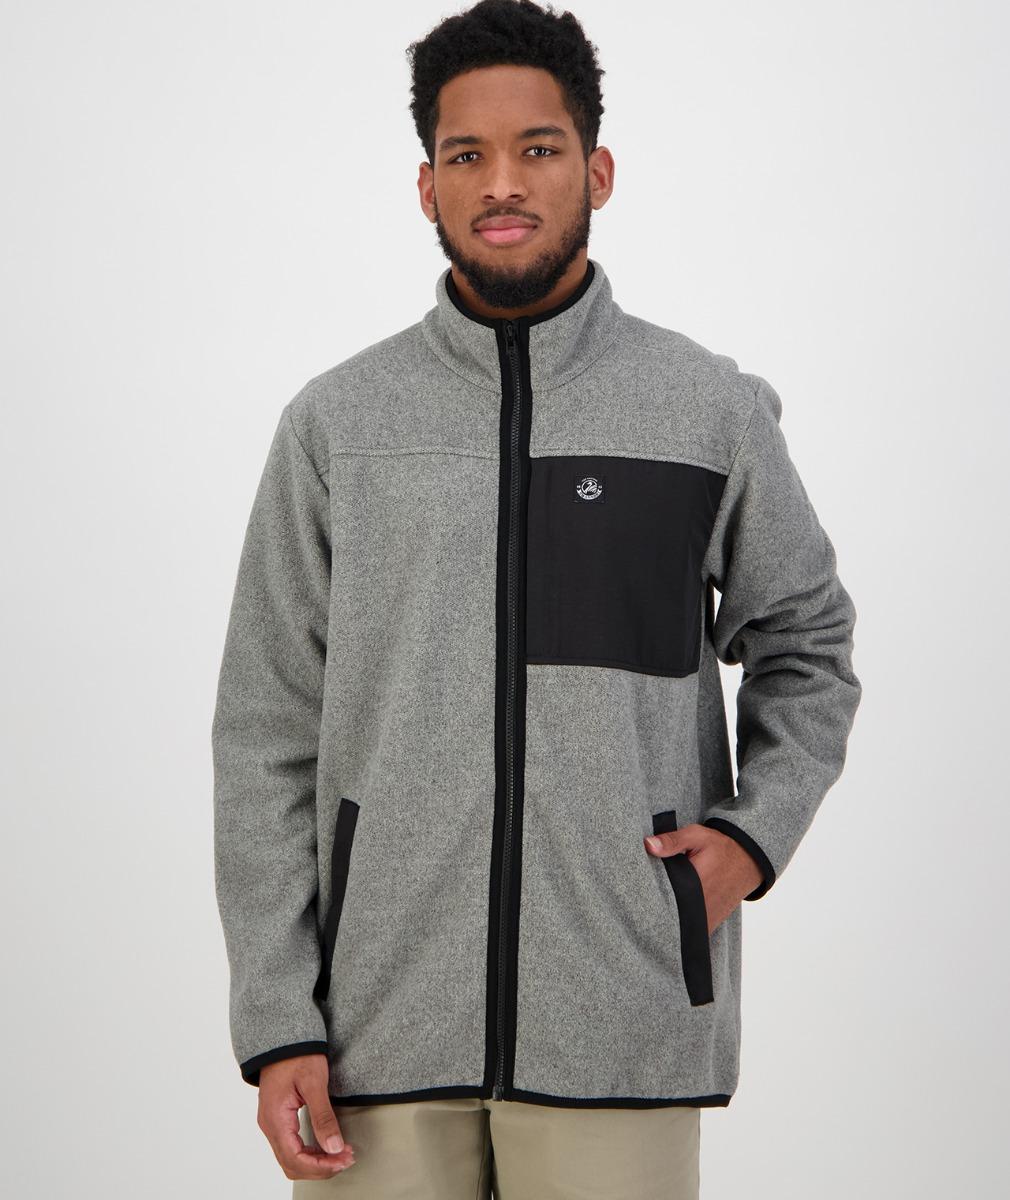 Hazelburn Fleece Jacket in Grey